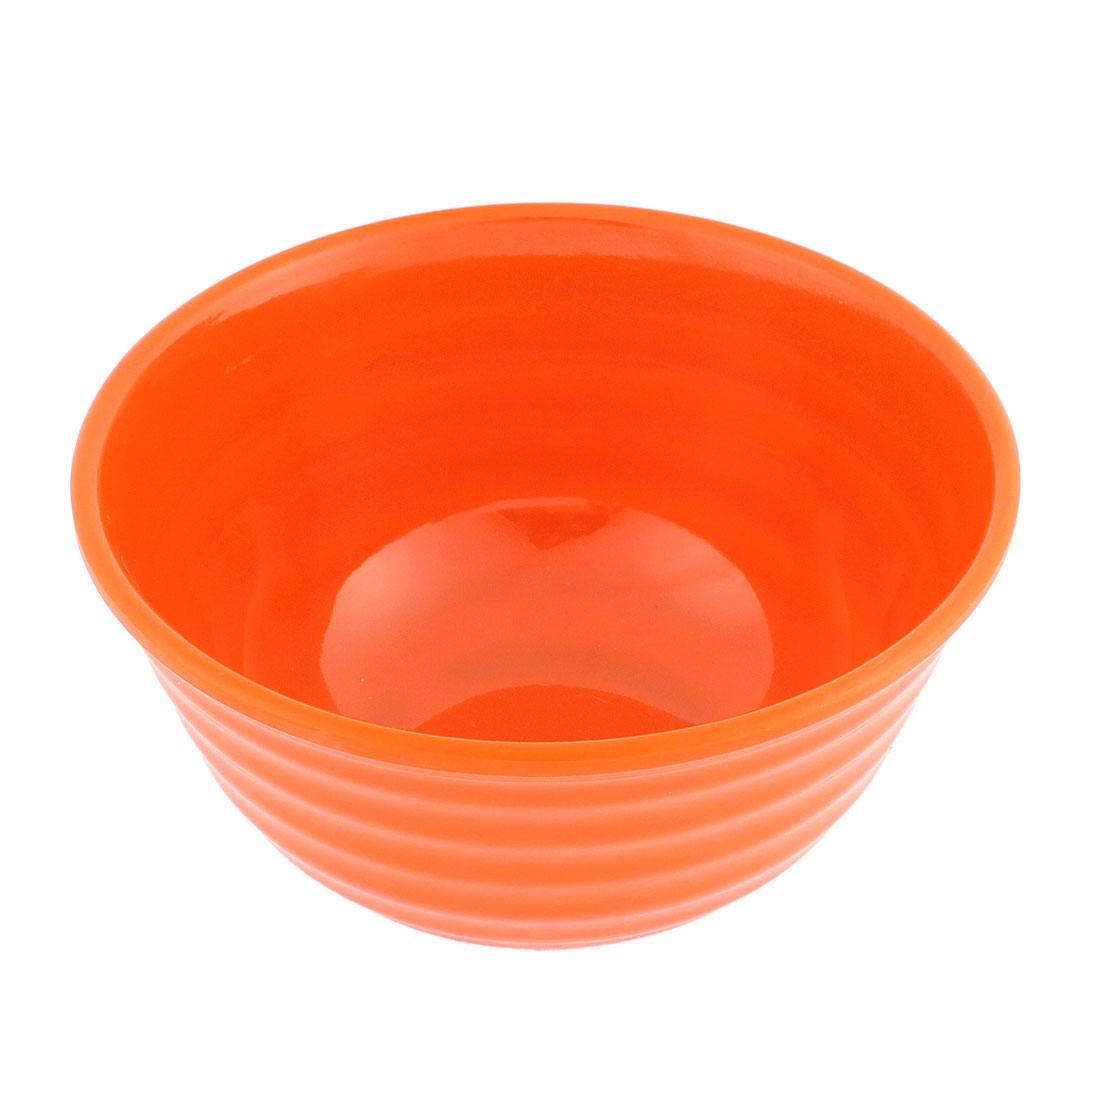 Family Tableware Plastic Round Shaped Food Rice Bowl Orange 15.5cm Dia